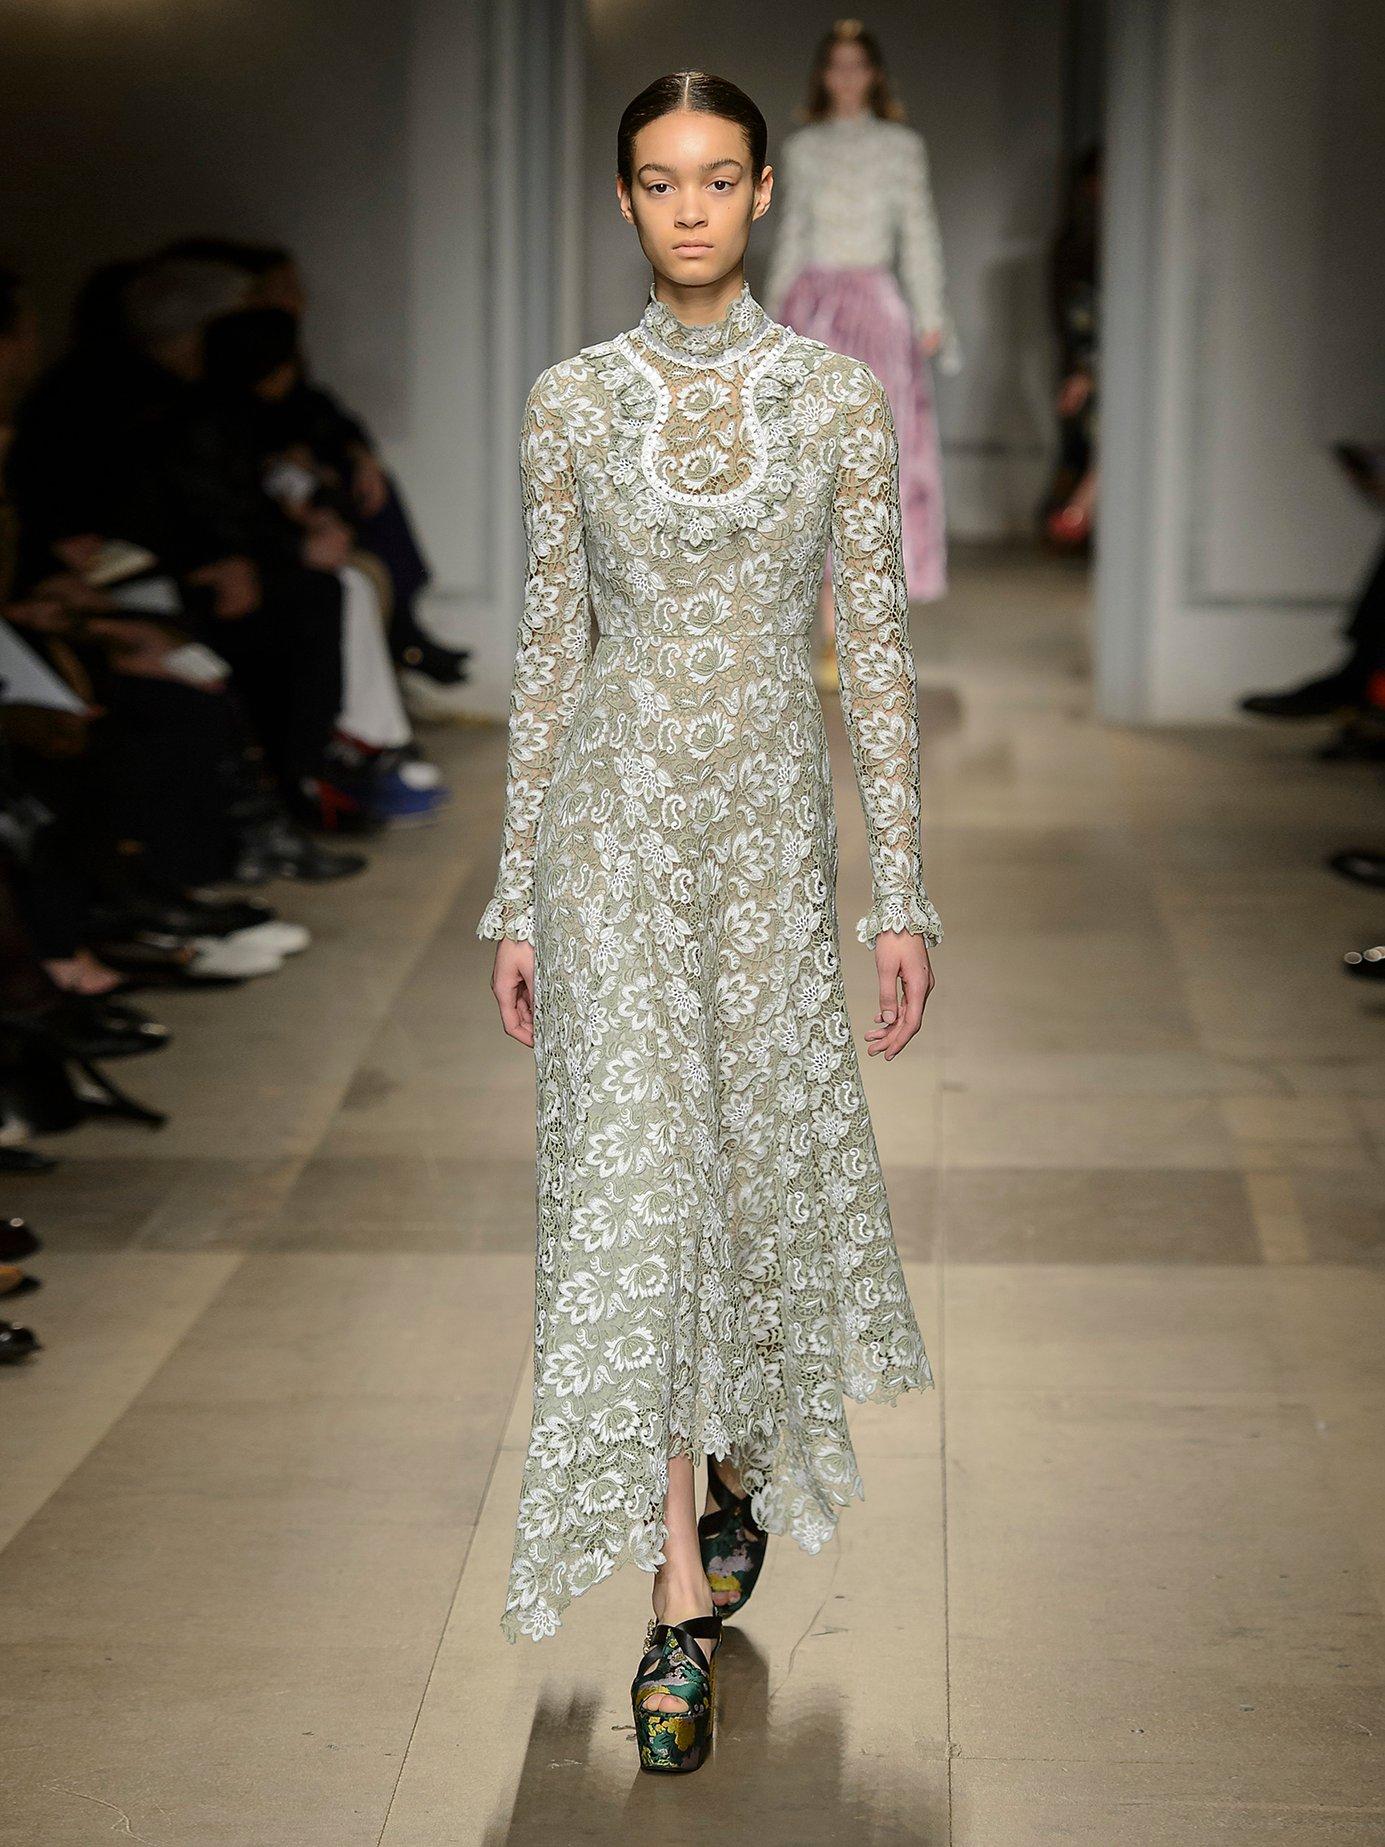 Shen high-neck floral guipure-lace dress by Erdem